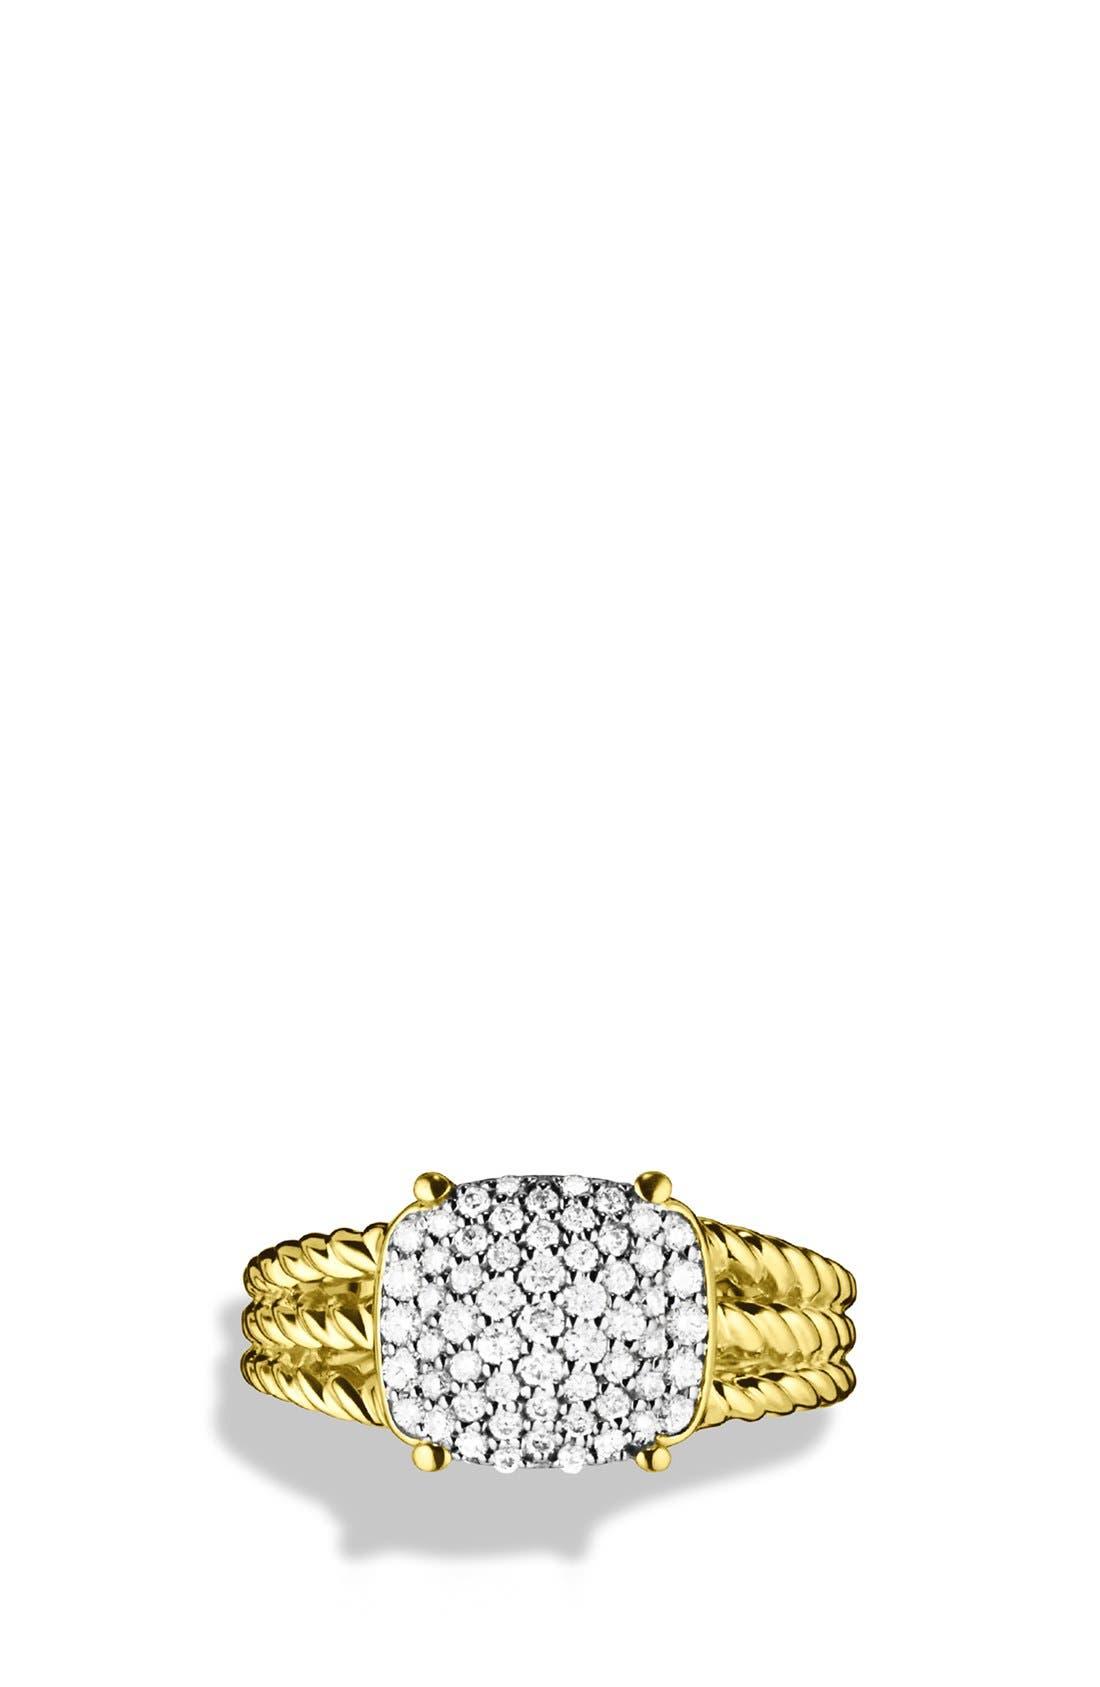 Alternate Image 3  - David Yurman 'Wheaton' Petite Ring with Diamonds in Gold